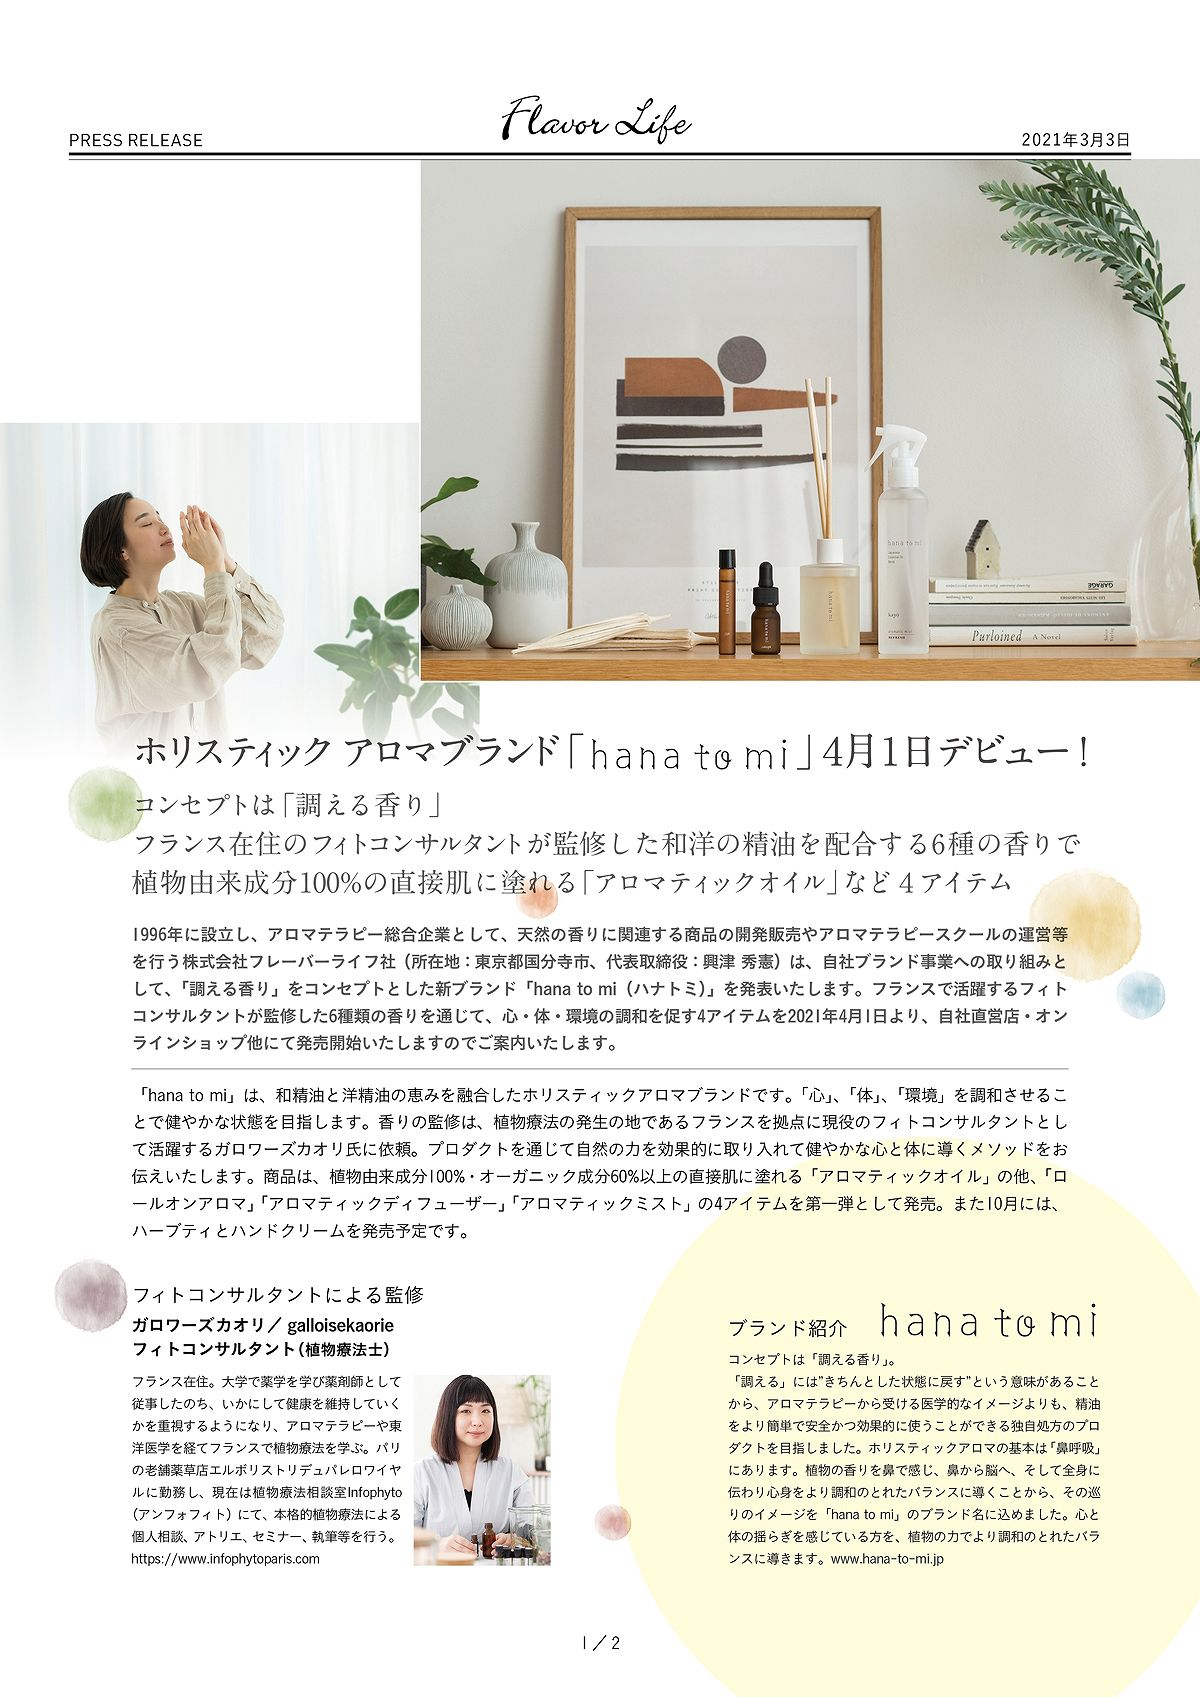 【PRESS RELEASE】新ブランド「hana to mi」デビュー/新商品4アイテム発売